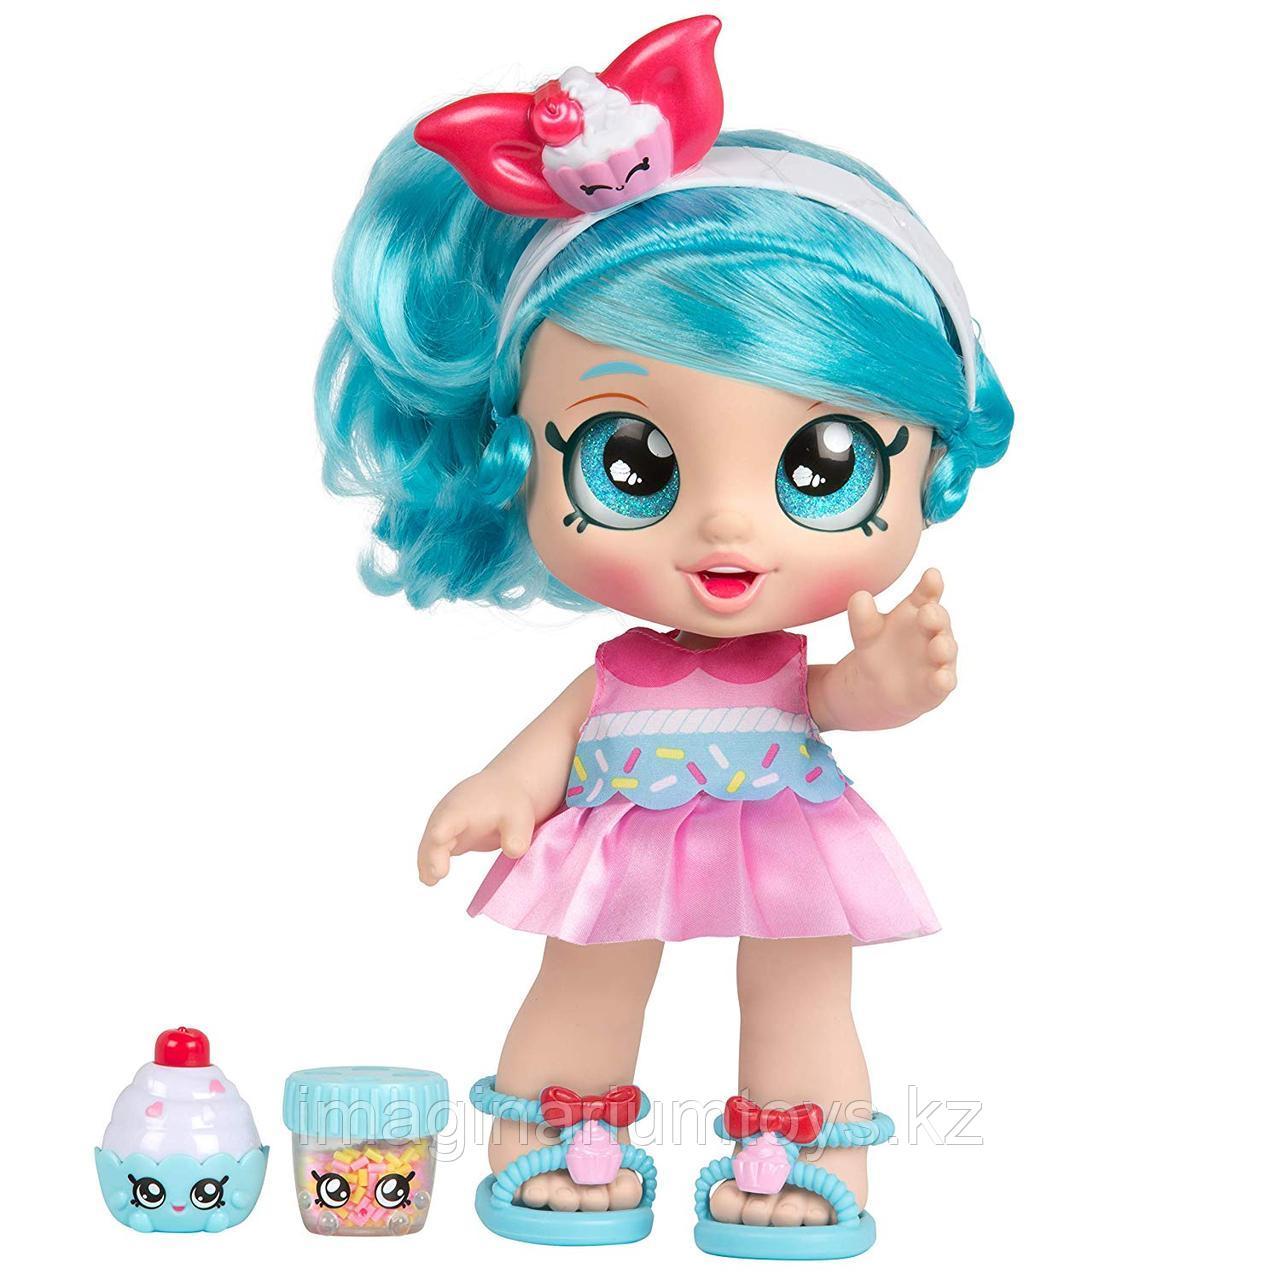 Kindi Kids Кукла Интерактивная Кинди Кидс Джессикейк